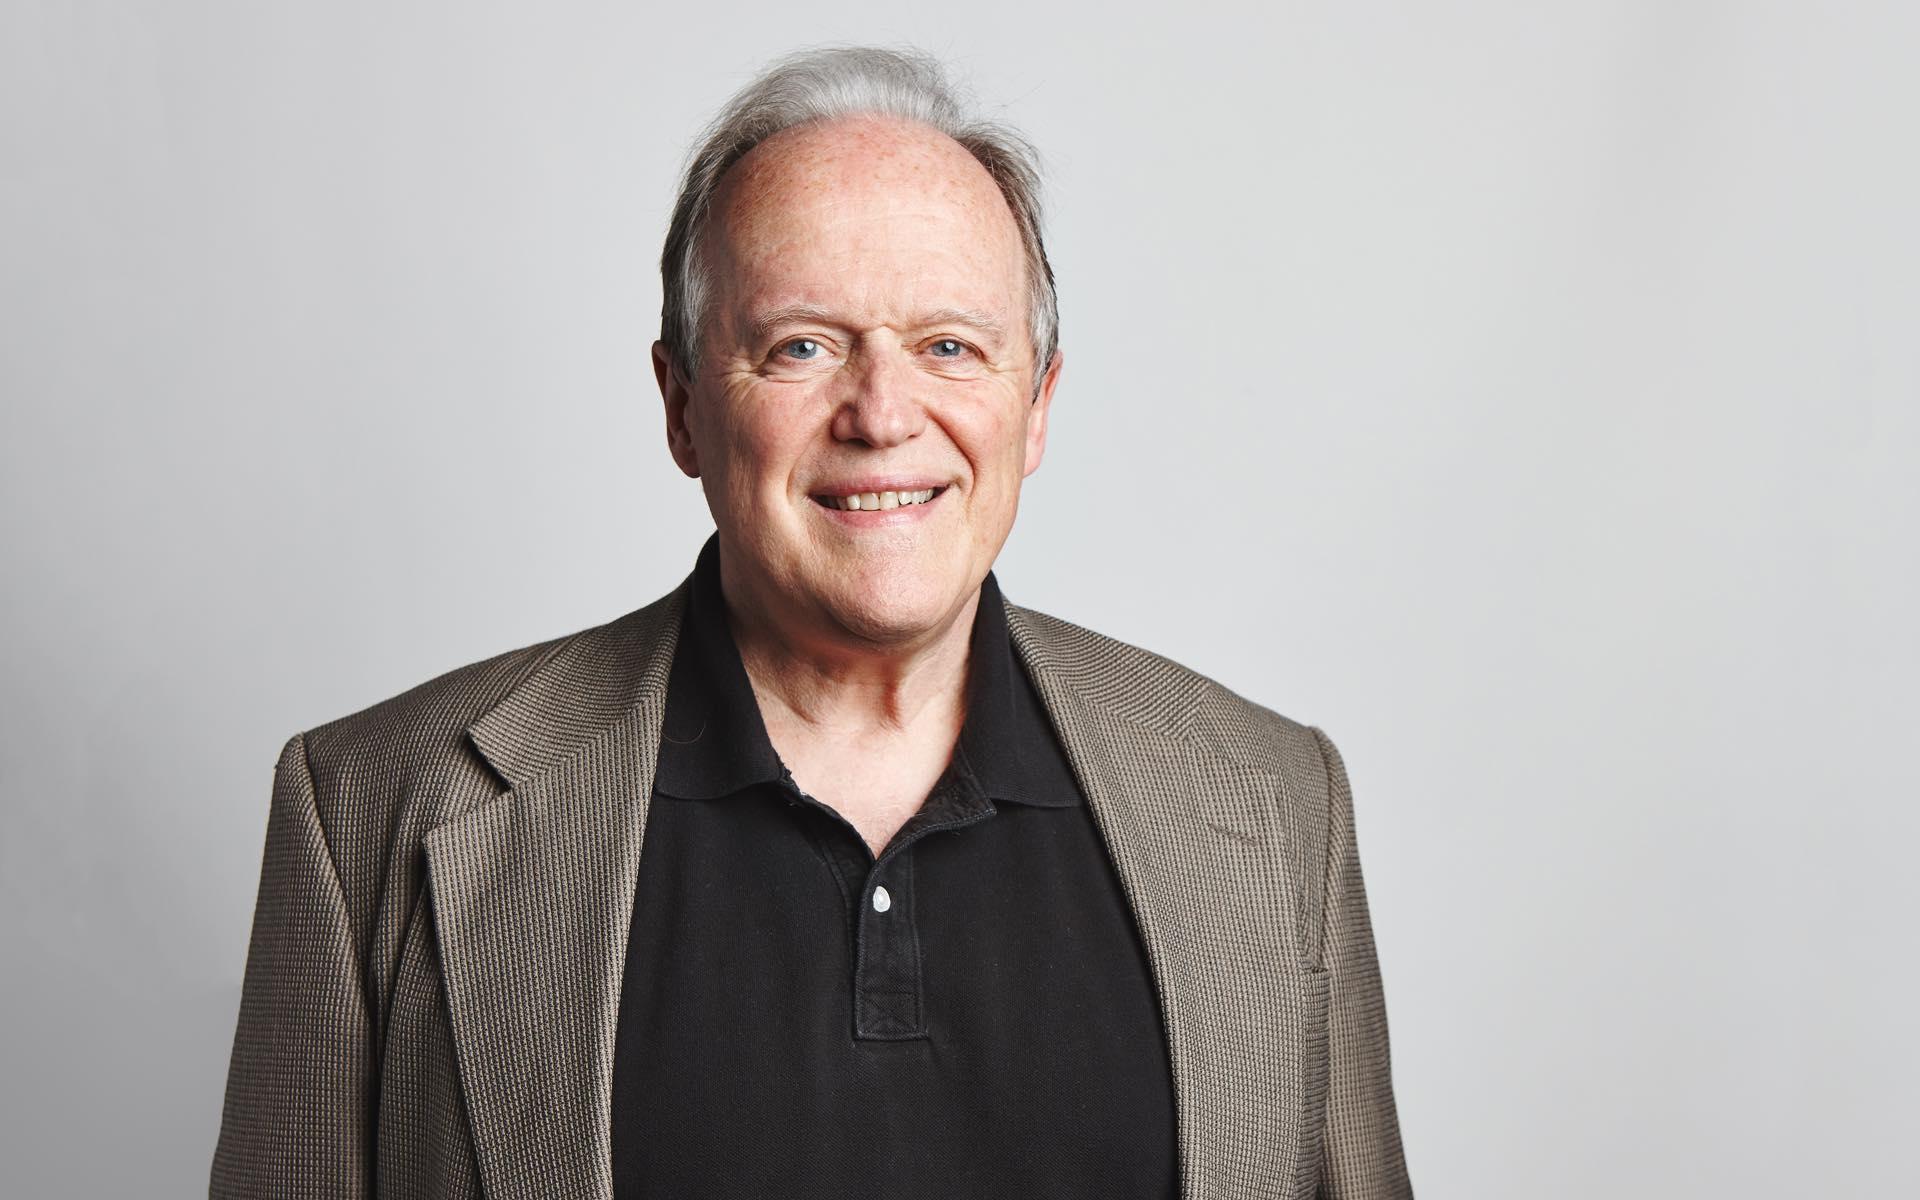 Music Law: E. Michael Harrington Talks Music Business